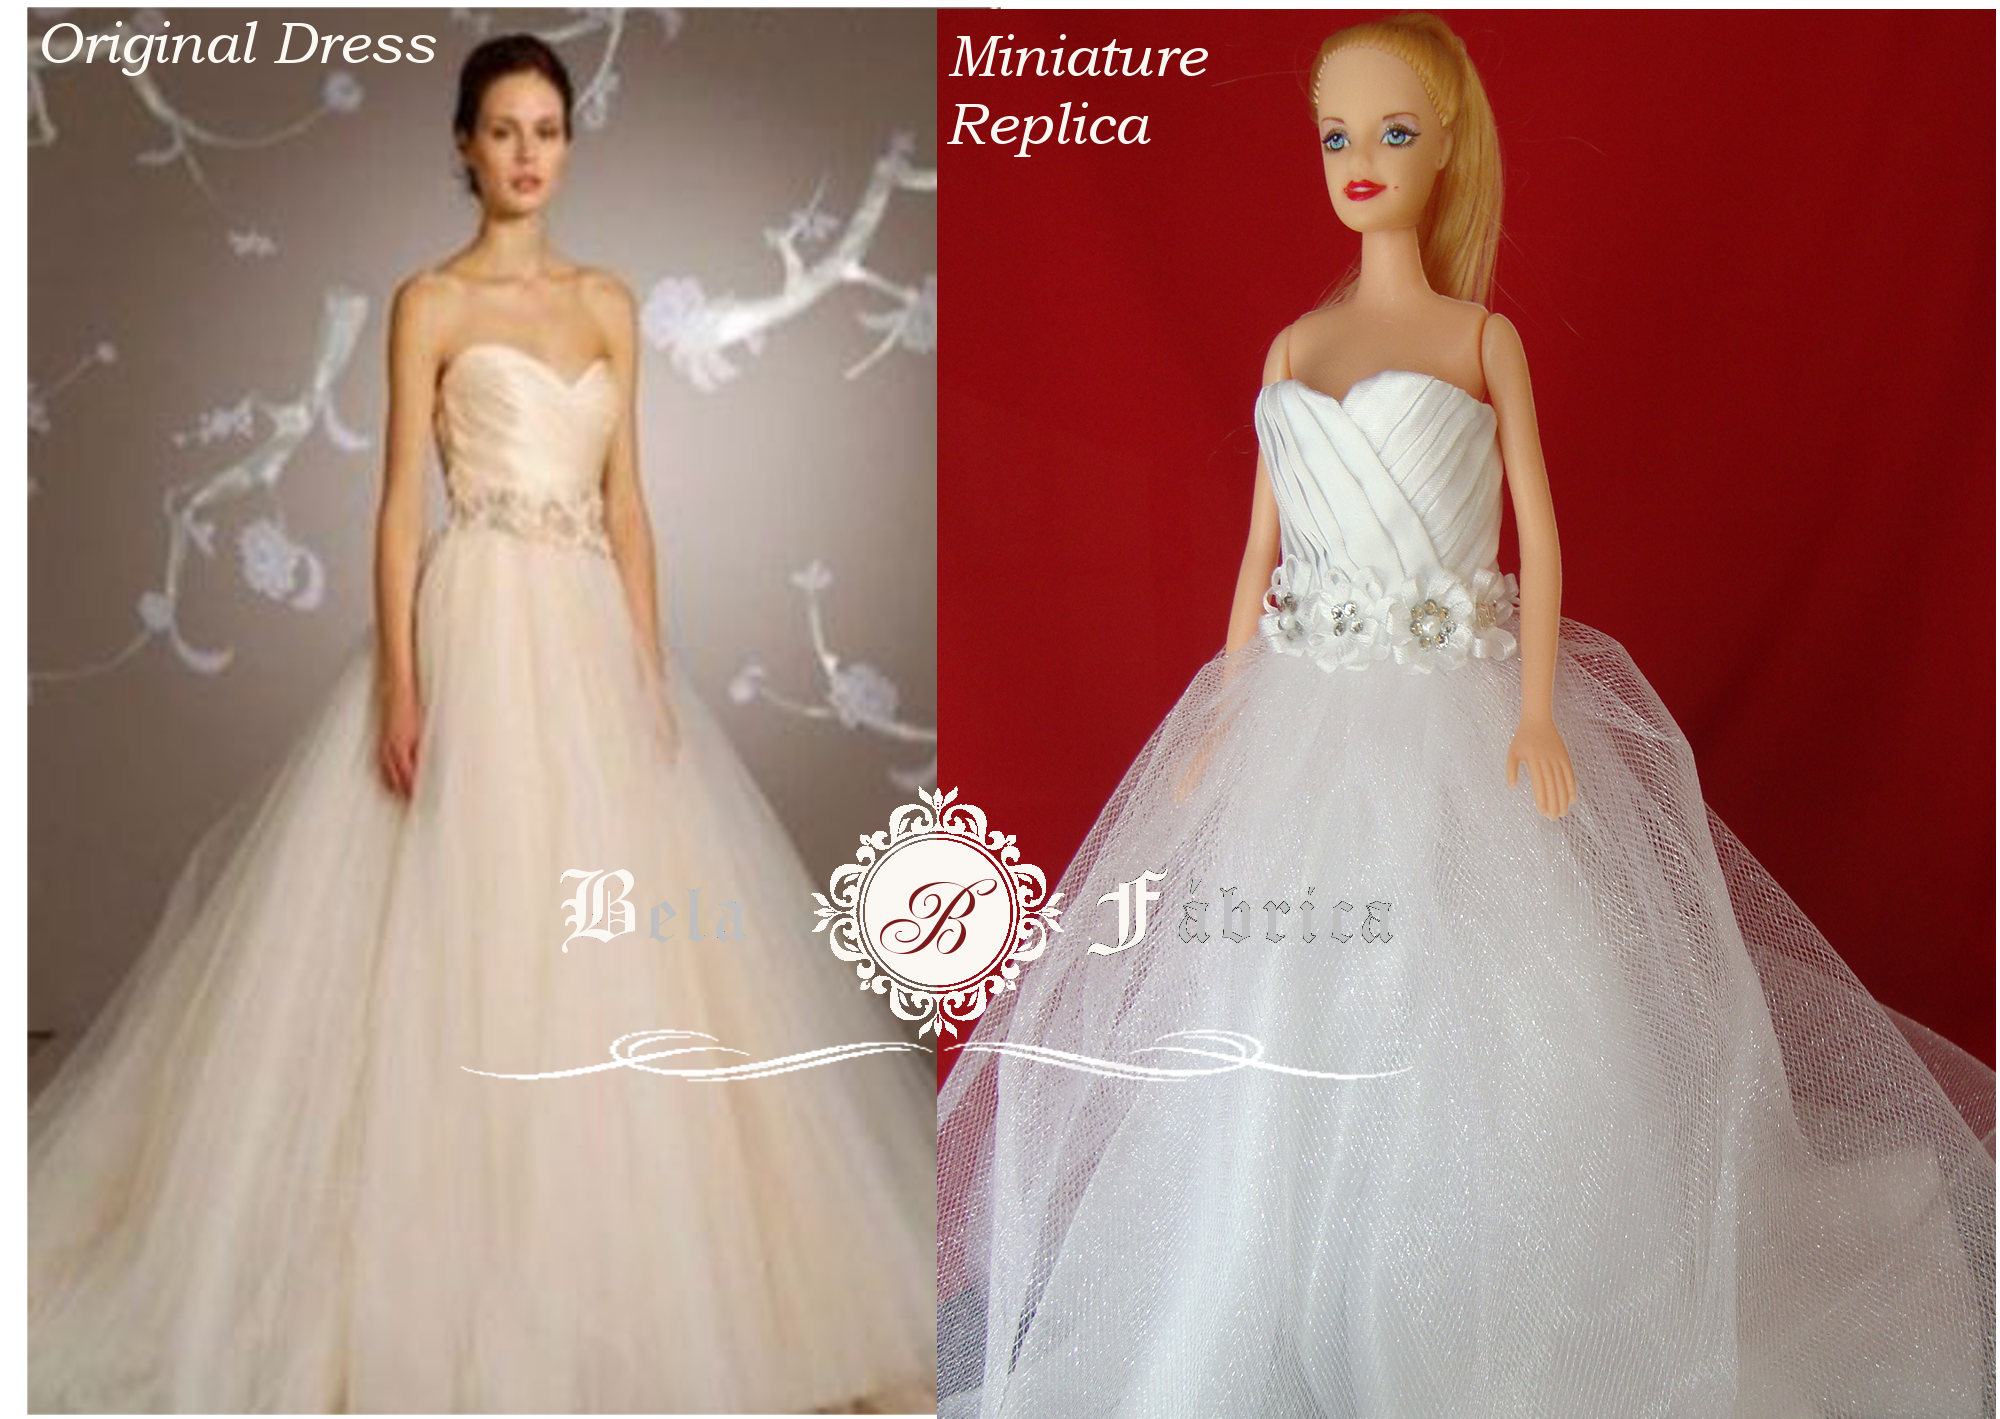 replica wedding dresses photo - 1